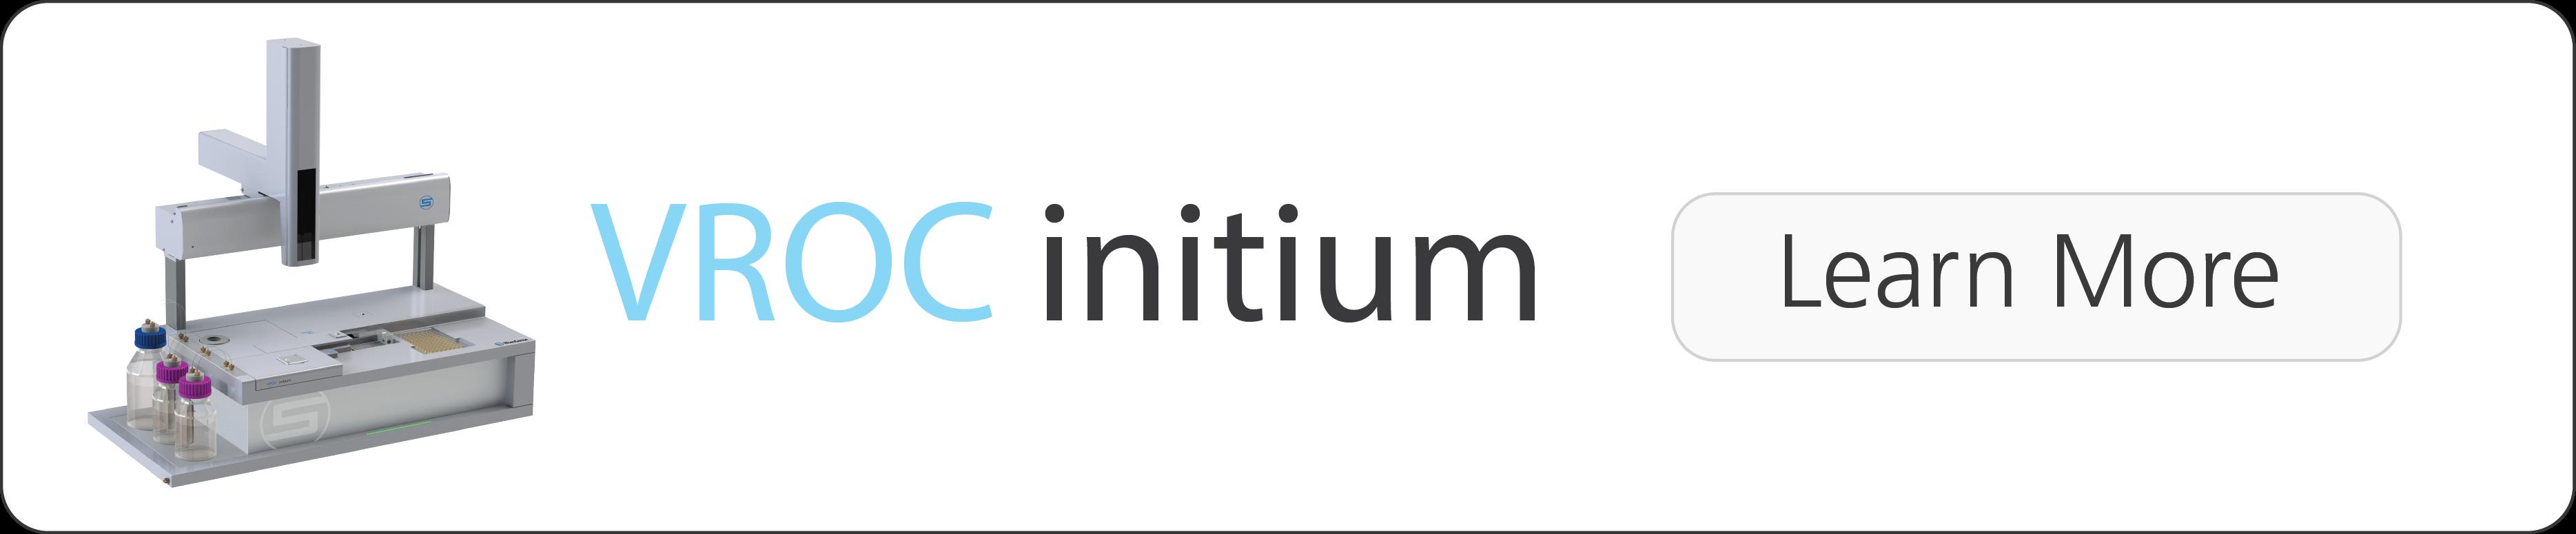 VROC initium Viscometer - Automatic, High-Throughput Viscosity Mesurements